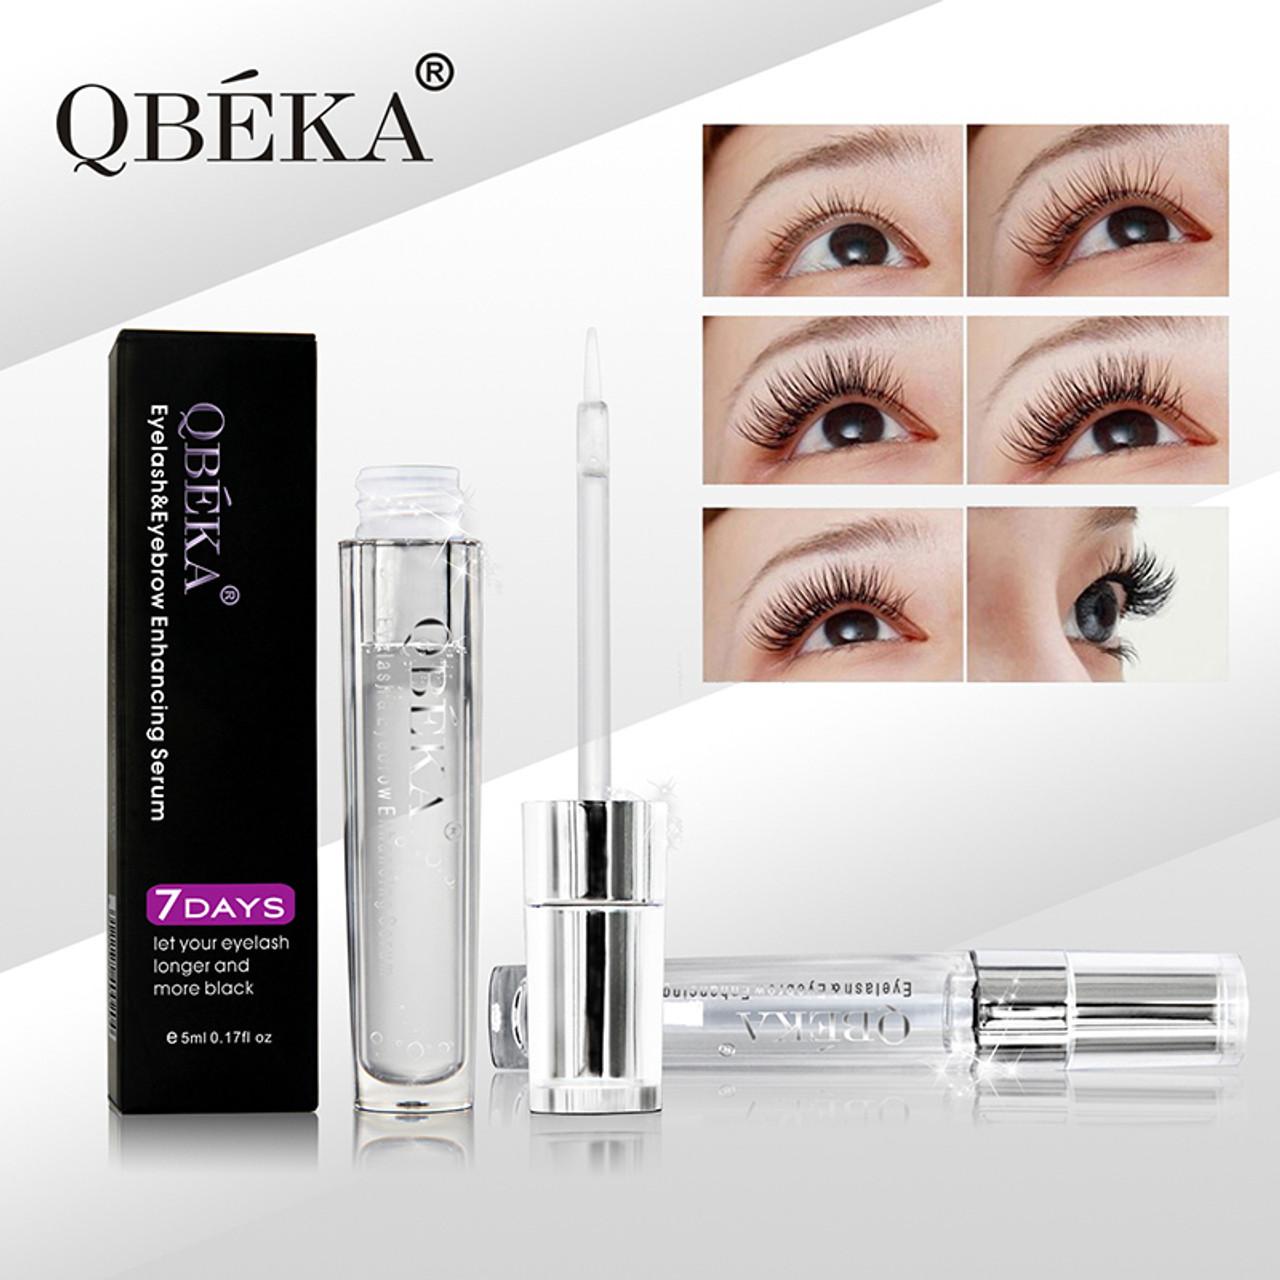 Ce Approval Qbeka Eyelash Eyebrow Enhancing Serum Eye Lashes Brow